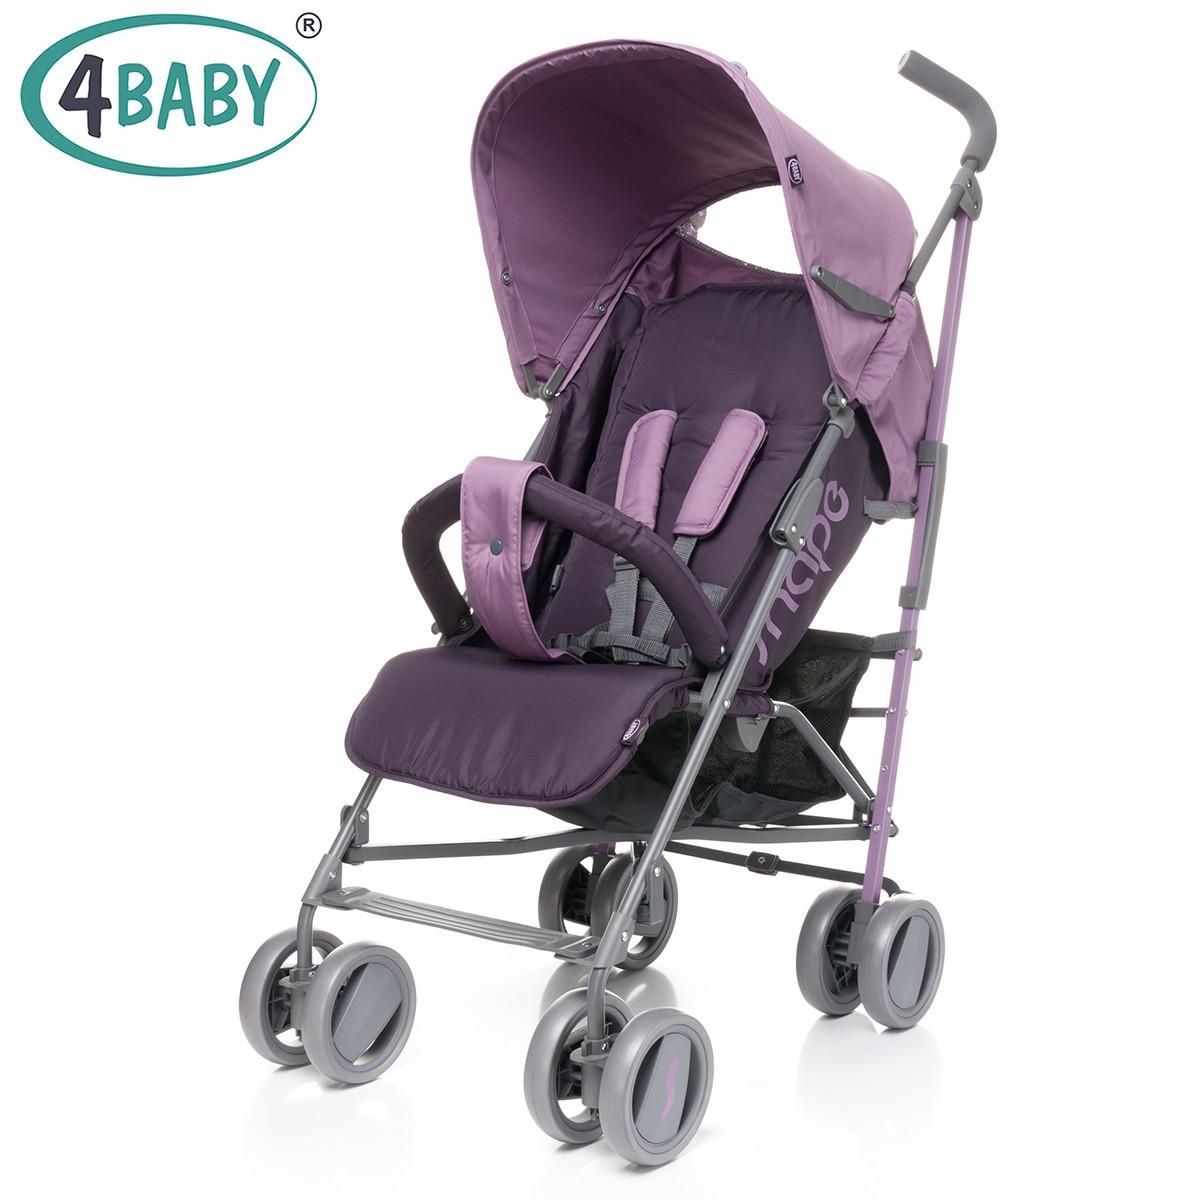 Коляска прогулочная 4 Baby Shape XVII Purple (фиолет)